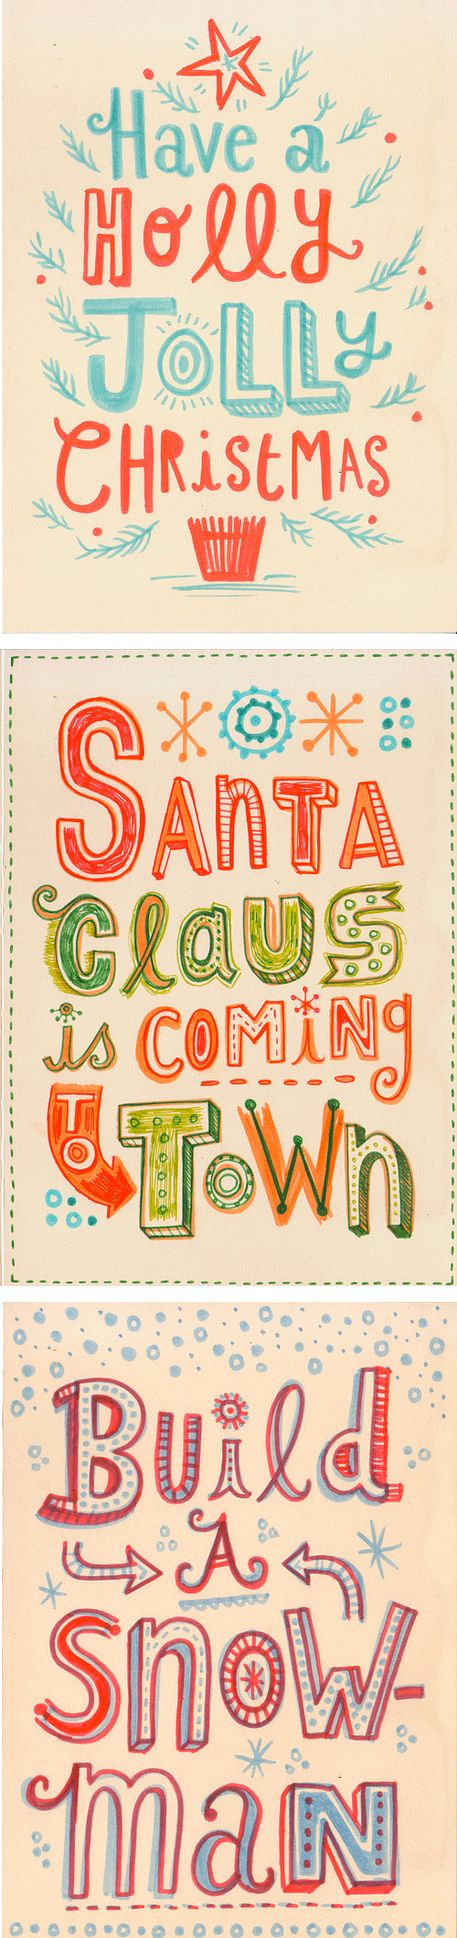 35 free Christmas printables (correct link: http://sassysites.blogspot.com/2011/12/35-free-christmas-printables.html)